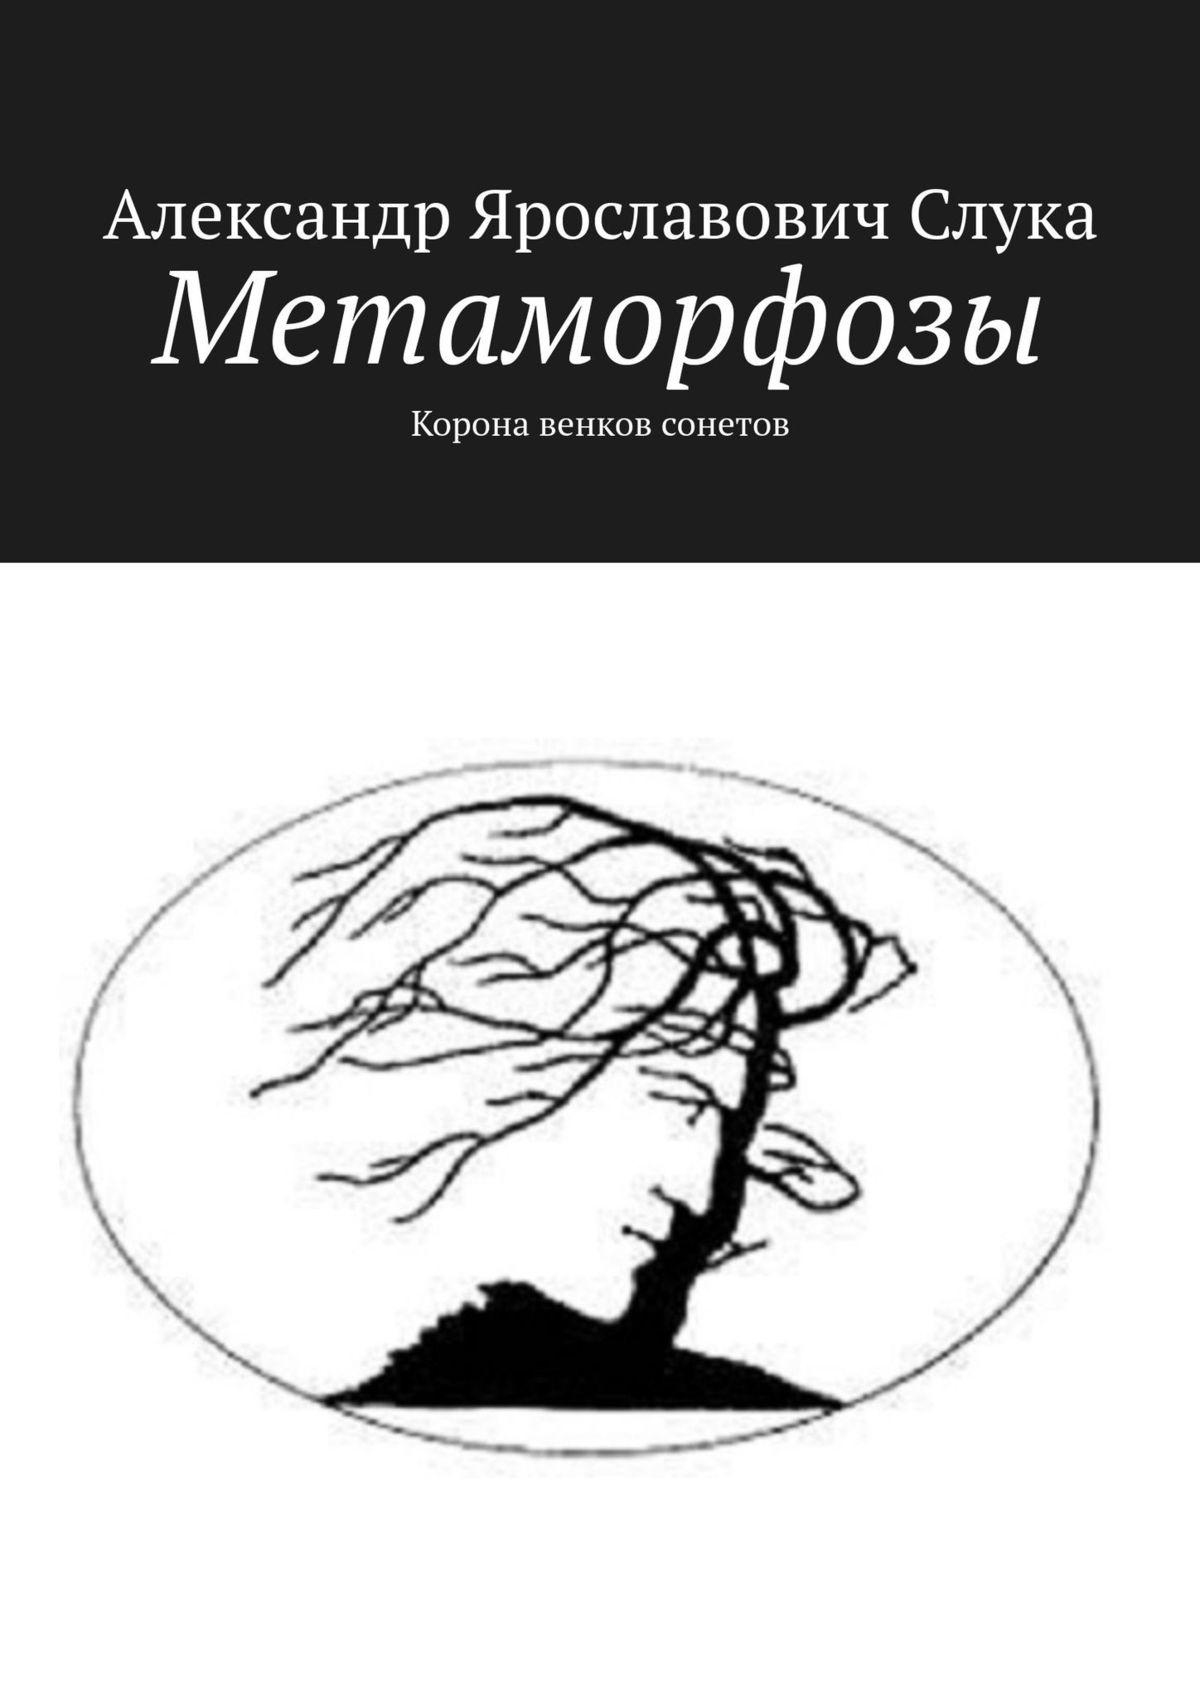 Купить книгу Метаморфозы. Корона венков сонетов, автора Александра Ярославовича Слуки